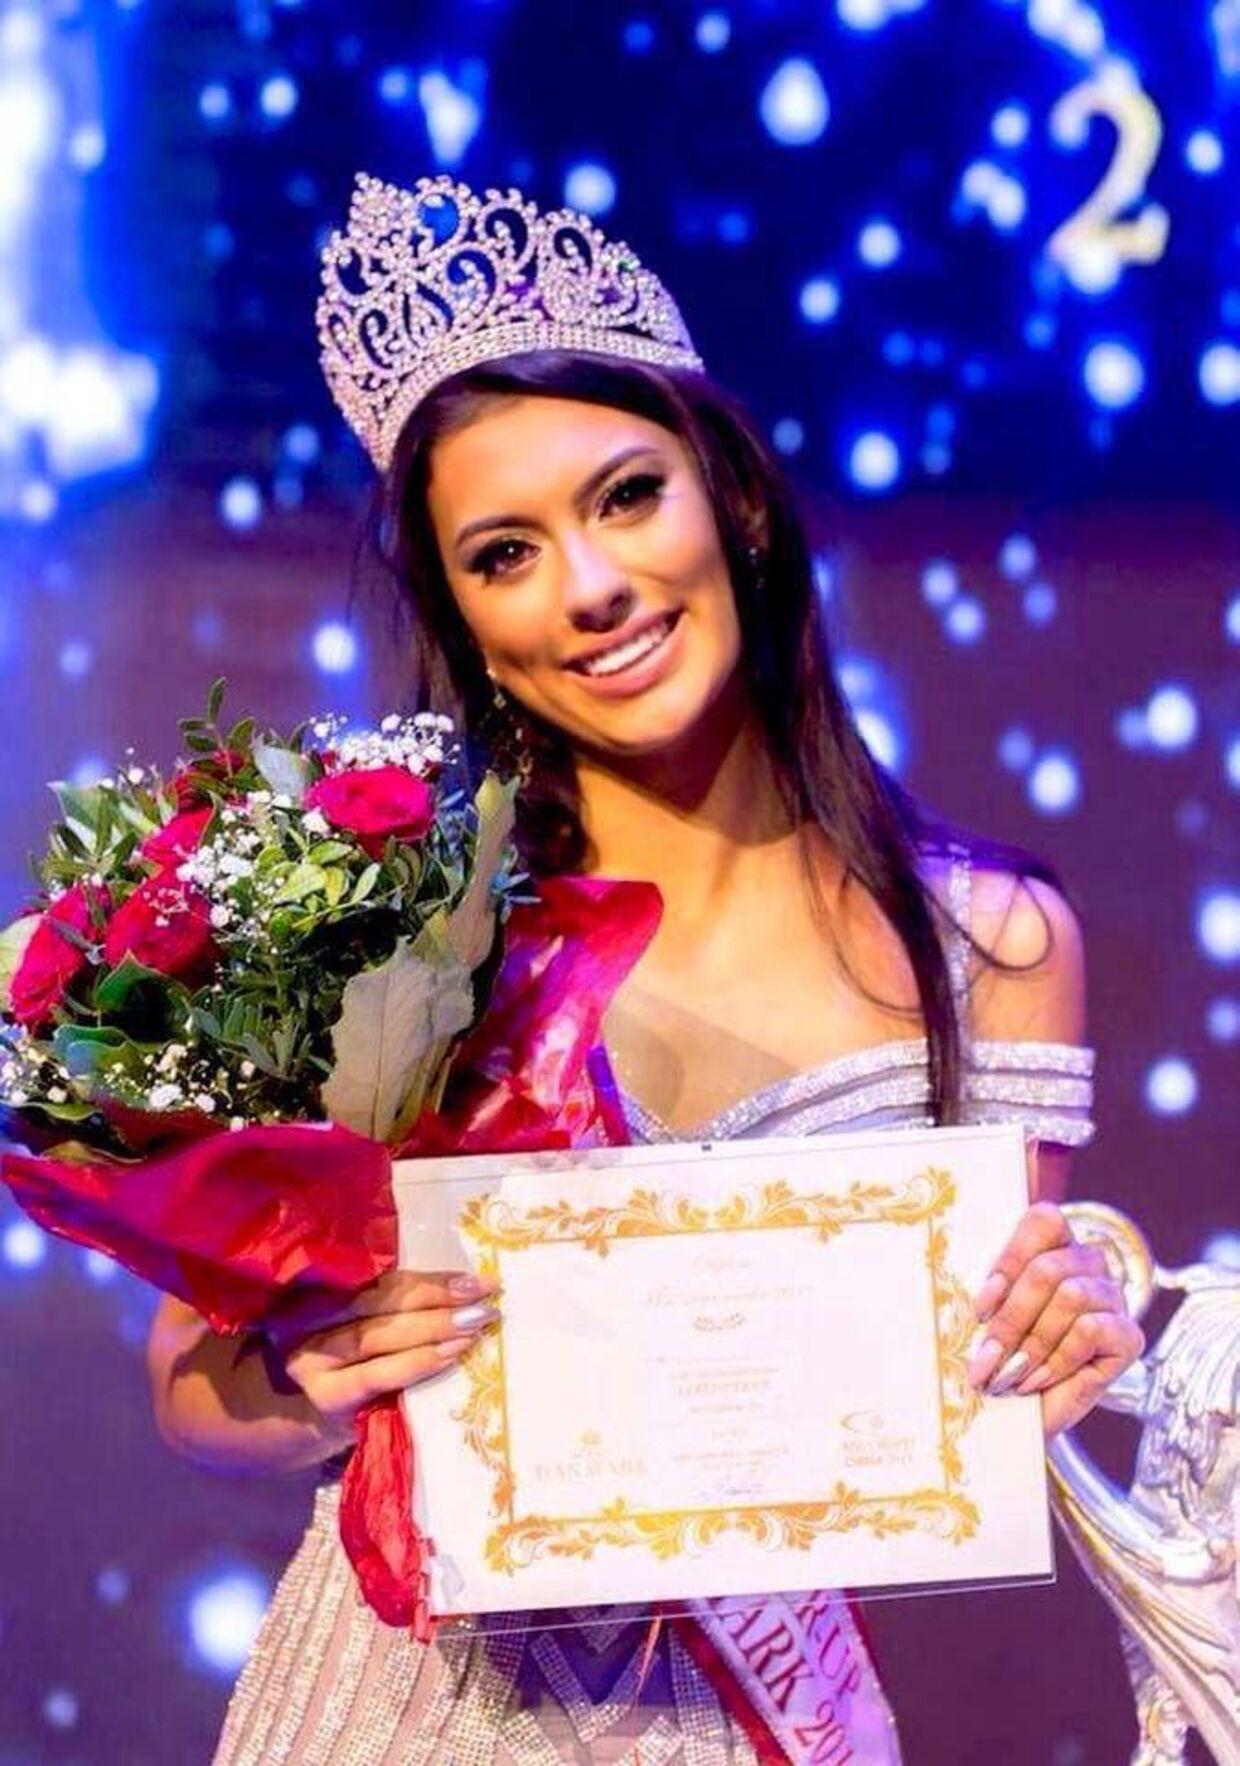 Tara Jensen under sidste uges finale i Miss Danmark 2018. Foto: Raisul Jhilan / Miss Danmark